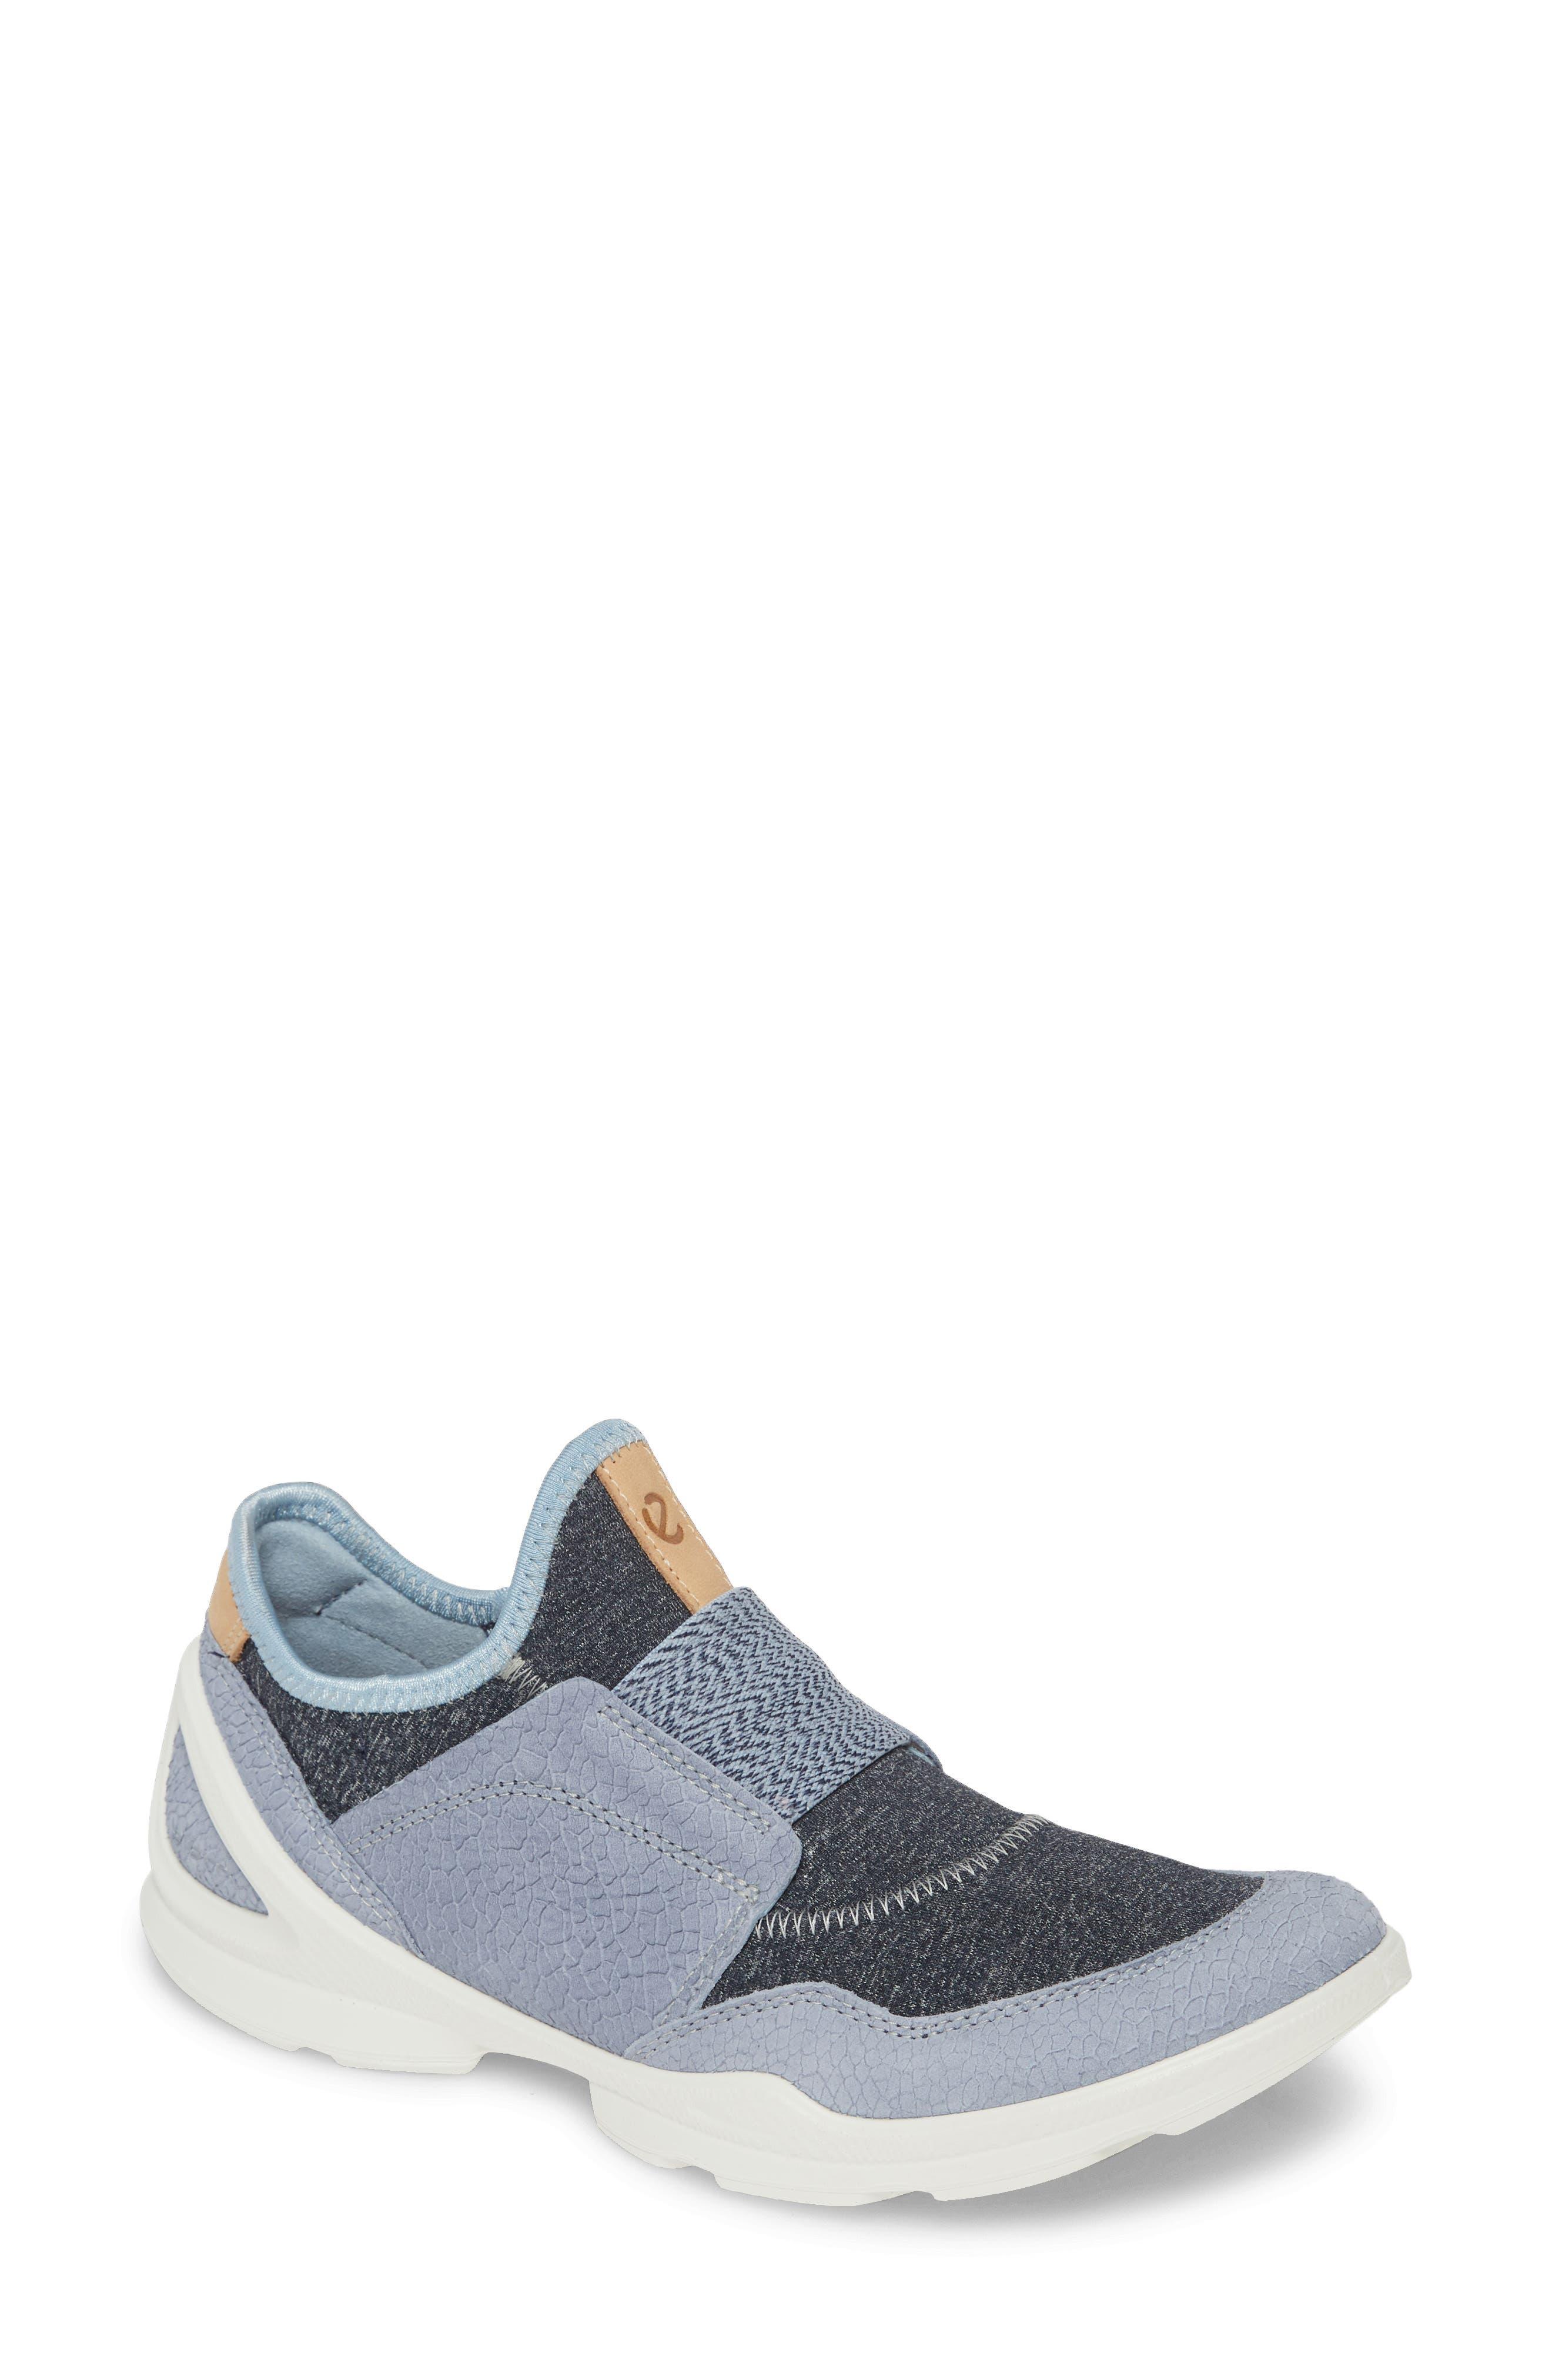 Image of ECCO Biom Street Sneaker